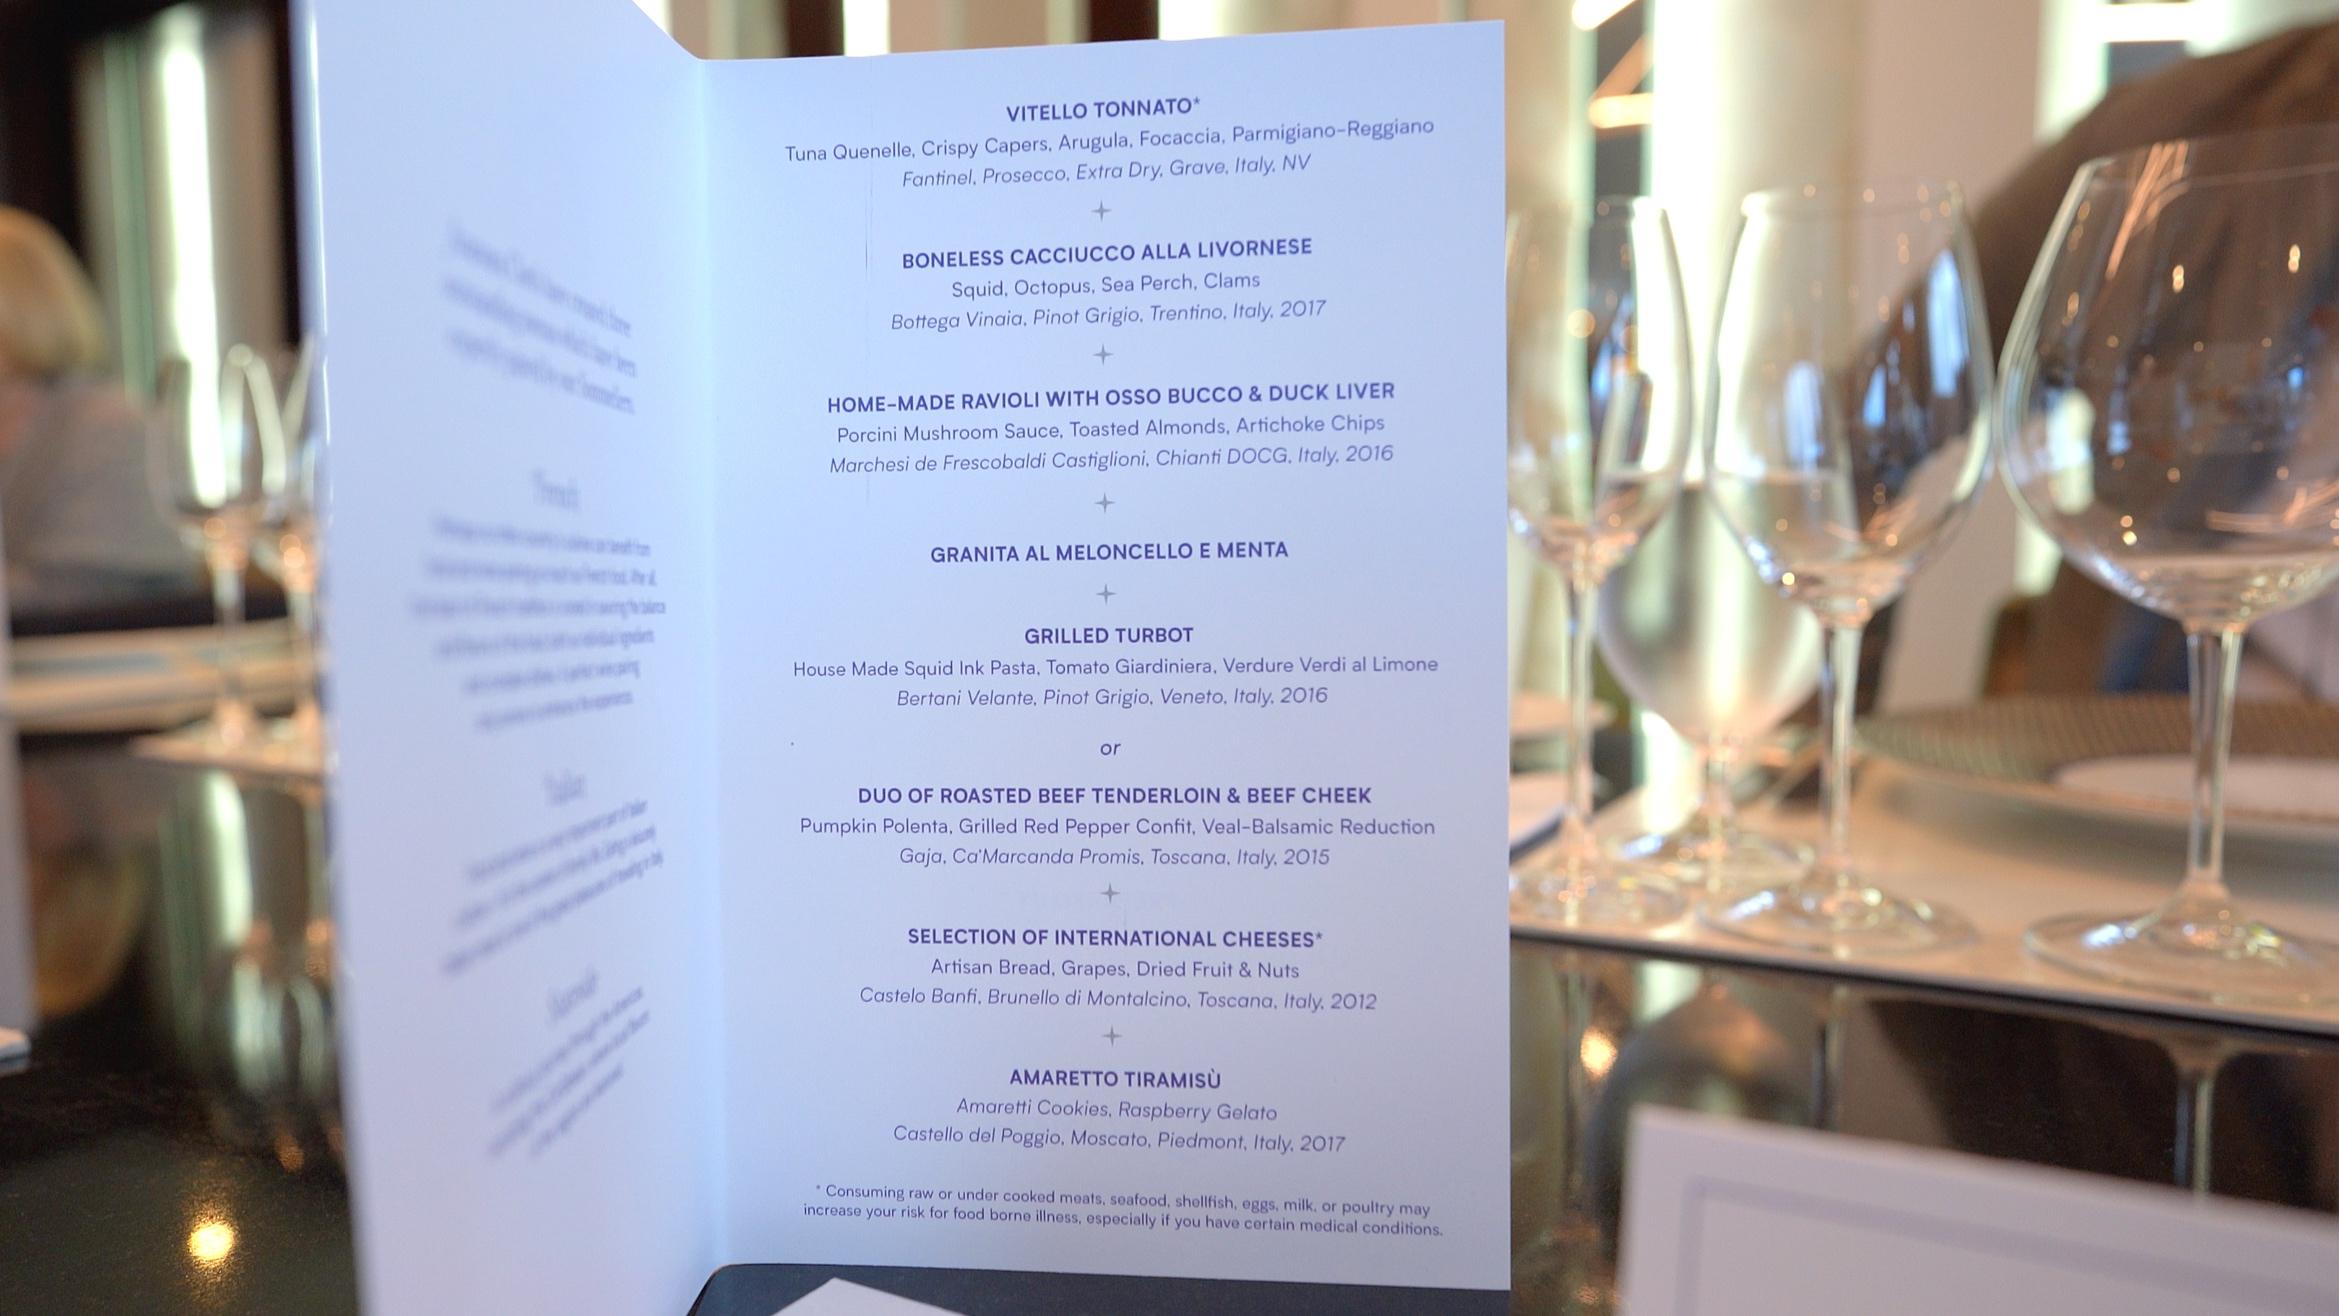 The Italian Chefs table menu